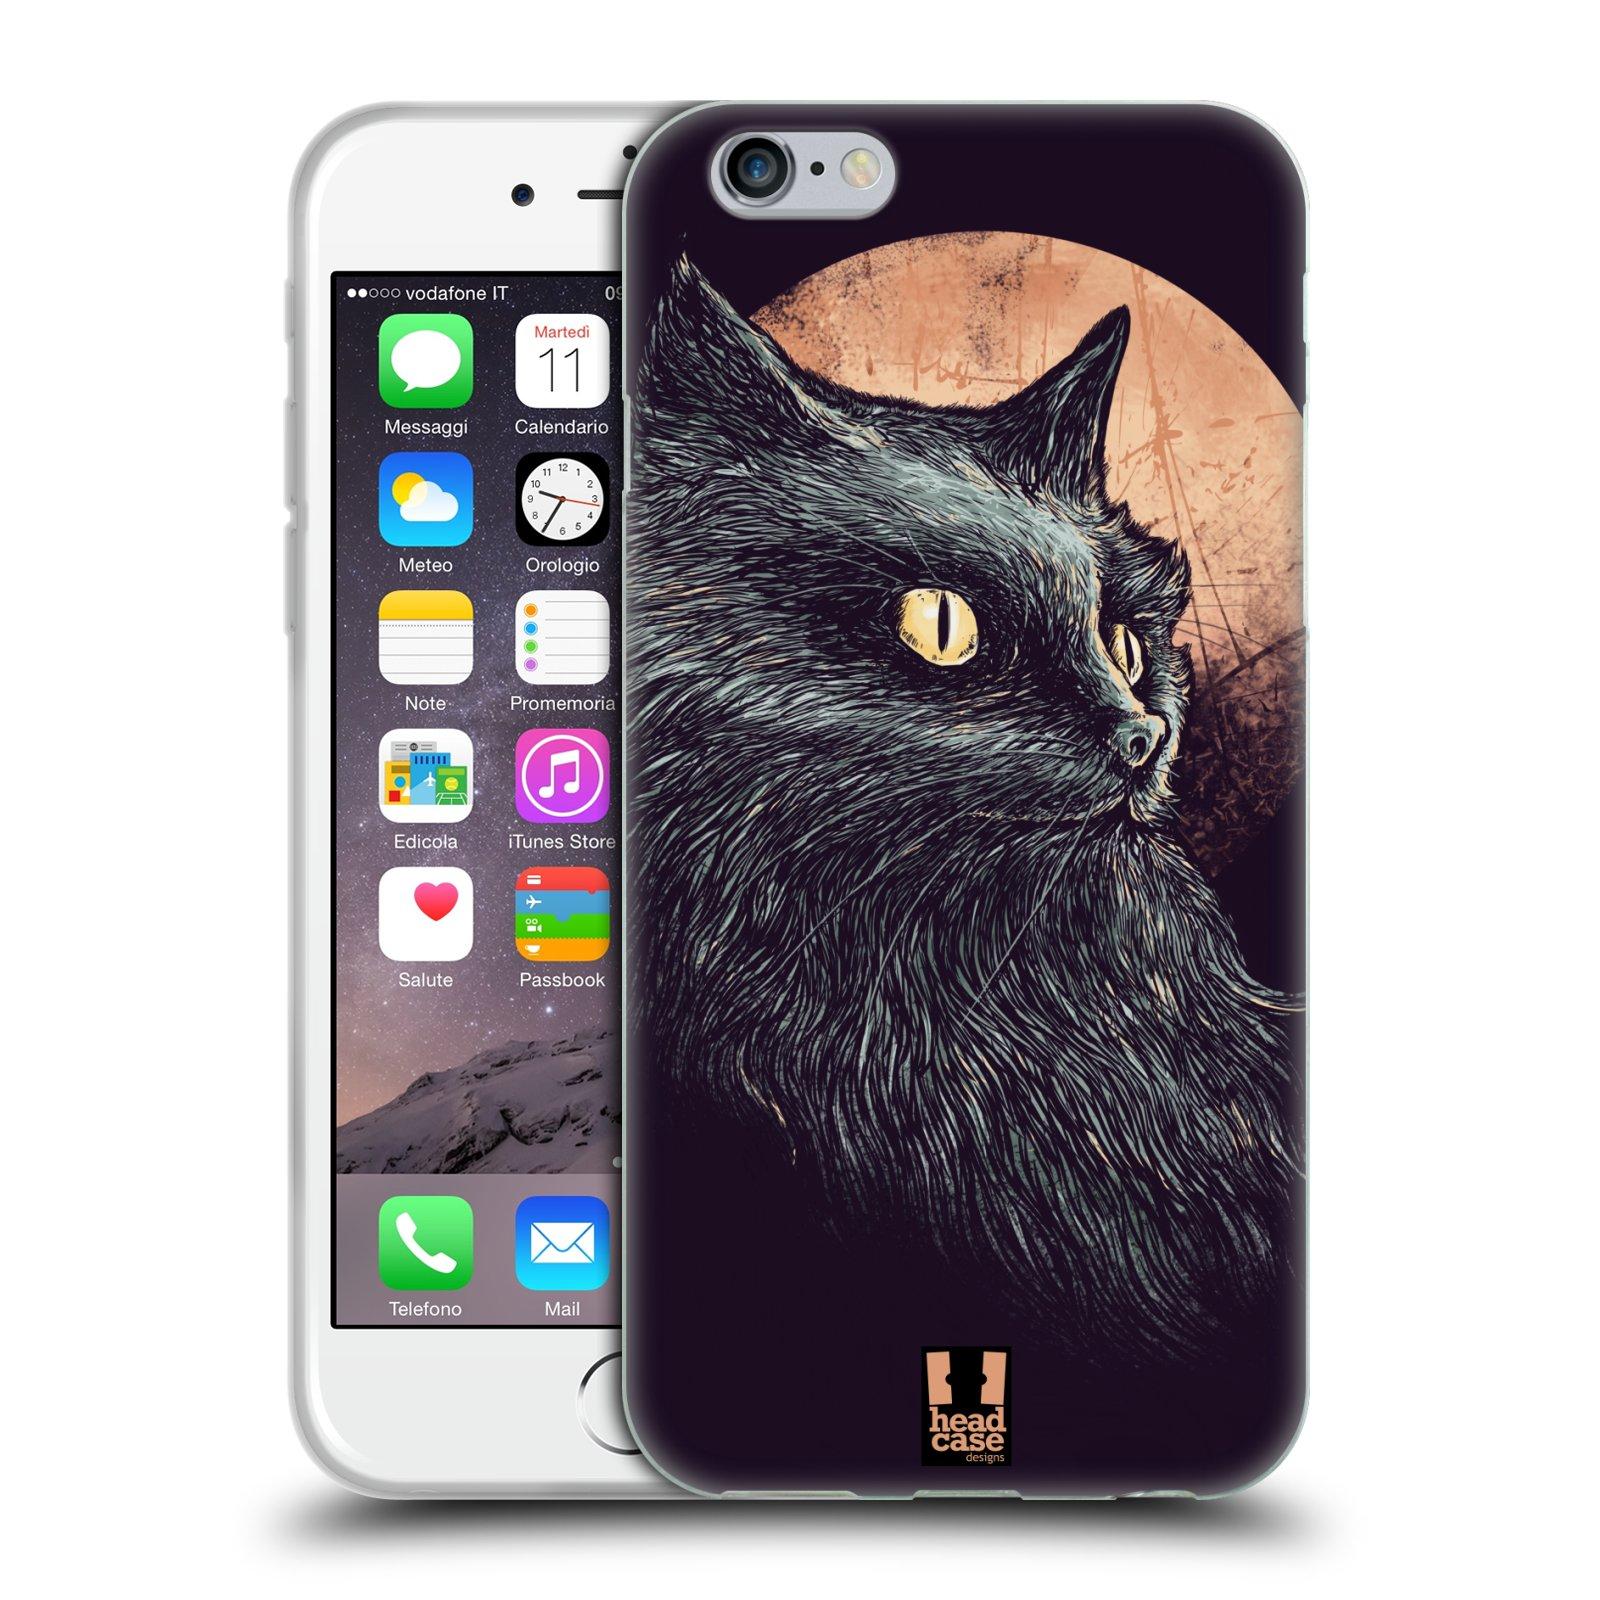 HEAD CASE silikonový obal na mobil Apple Iphone 6/6S vzor Gotická kočka oranžový měsíc